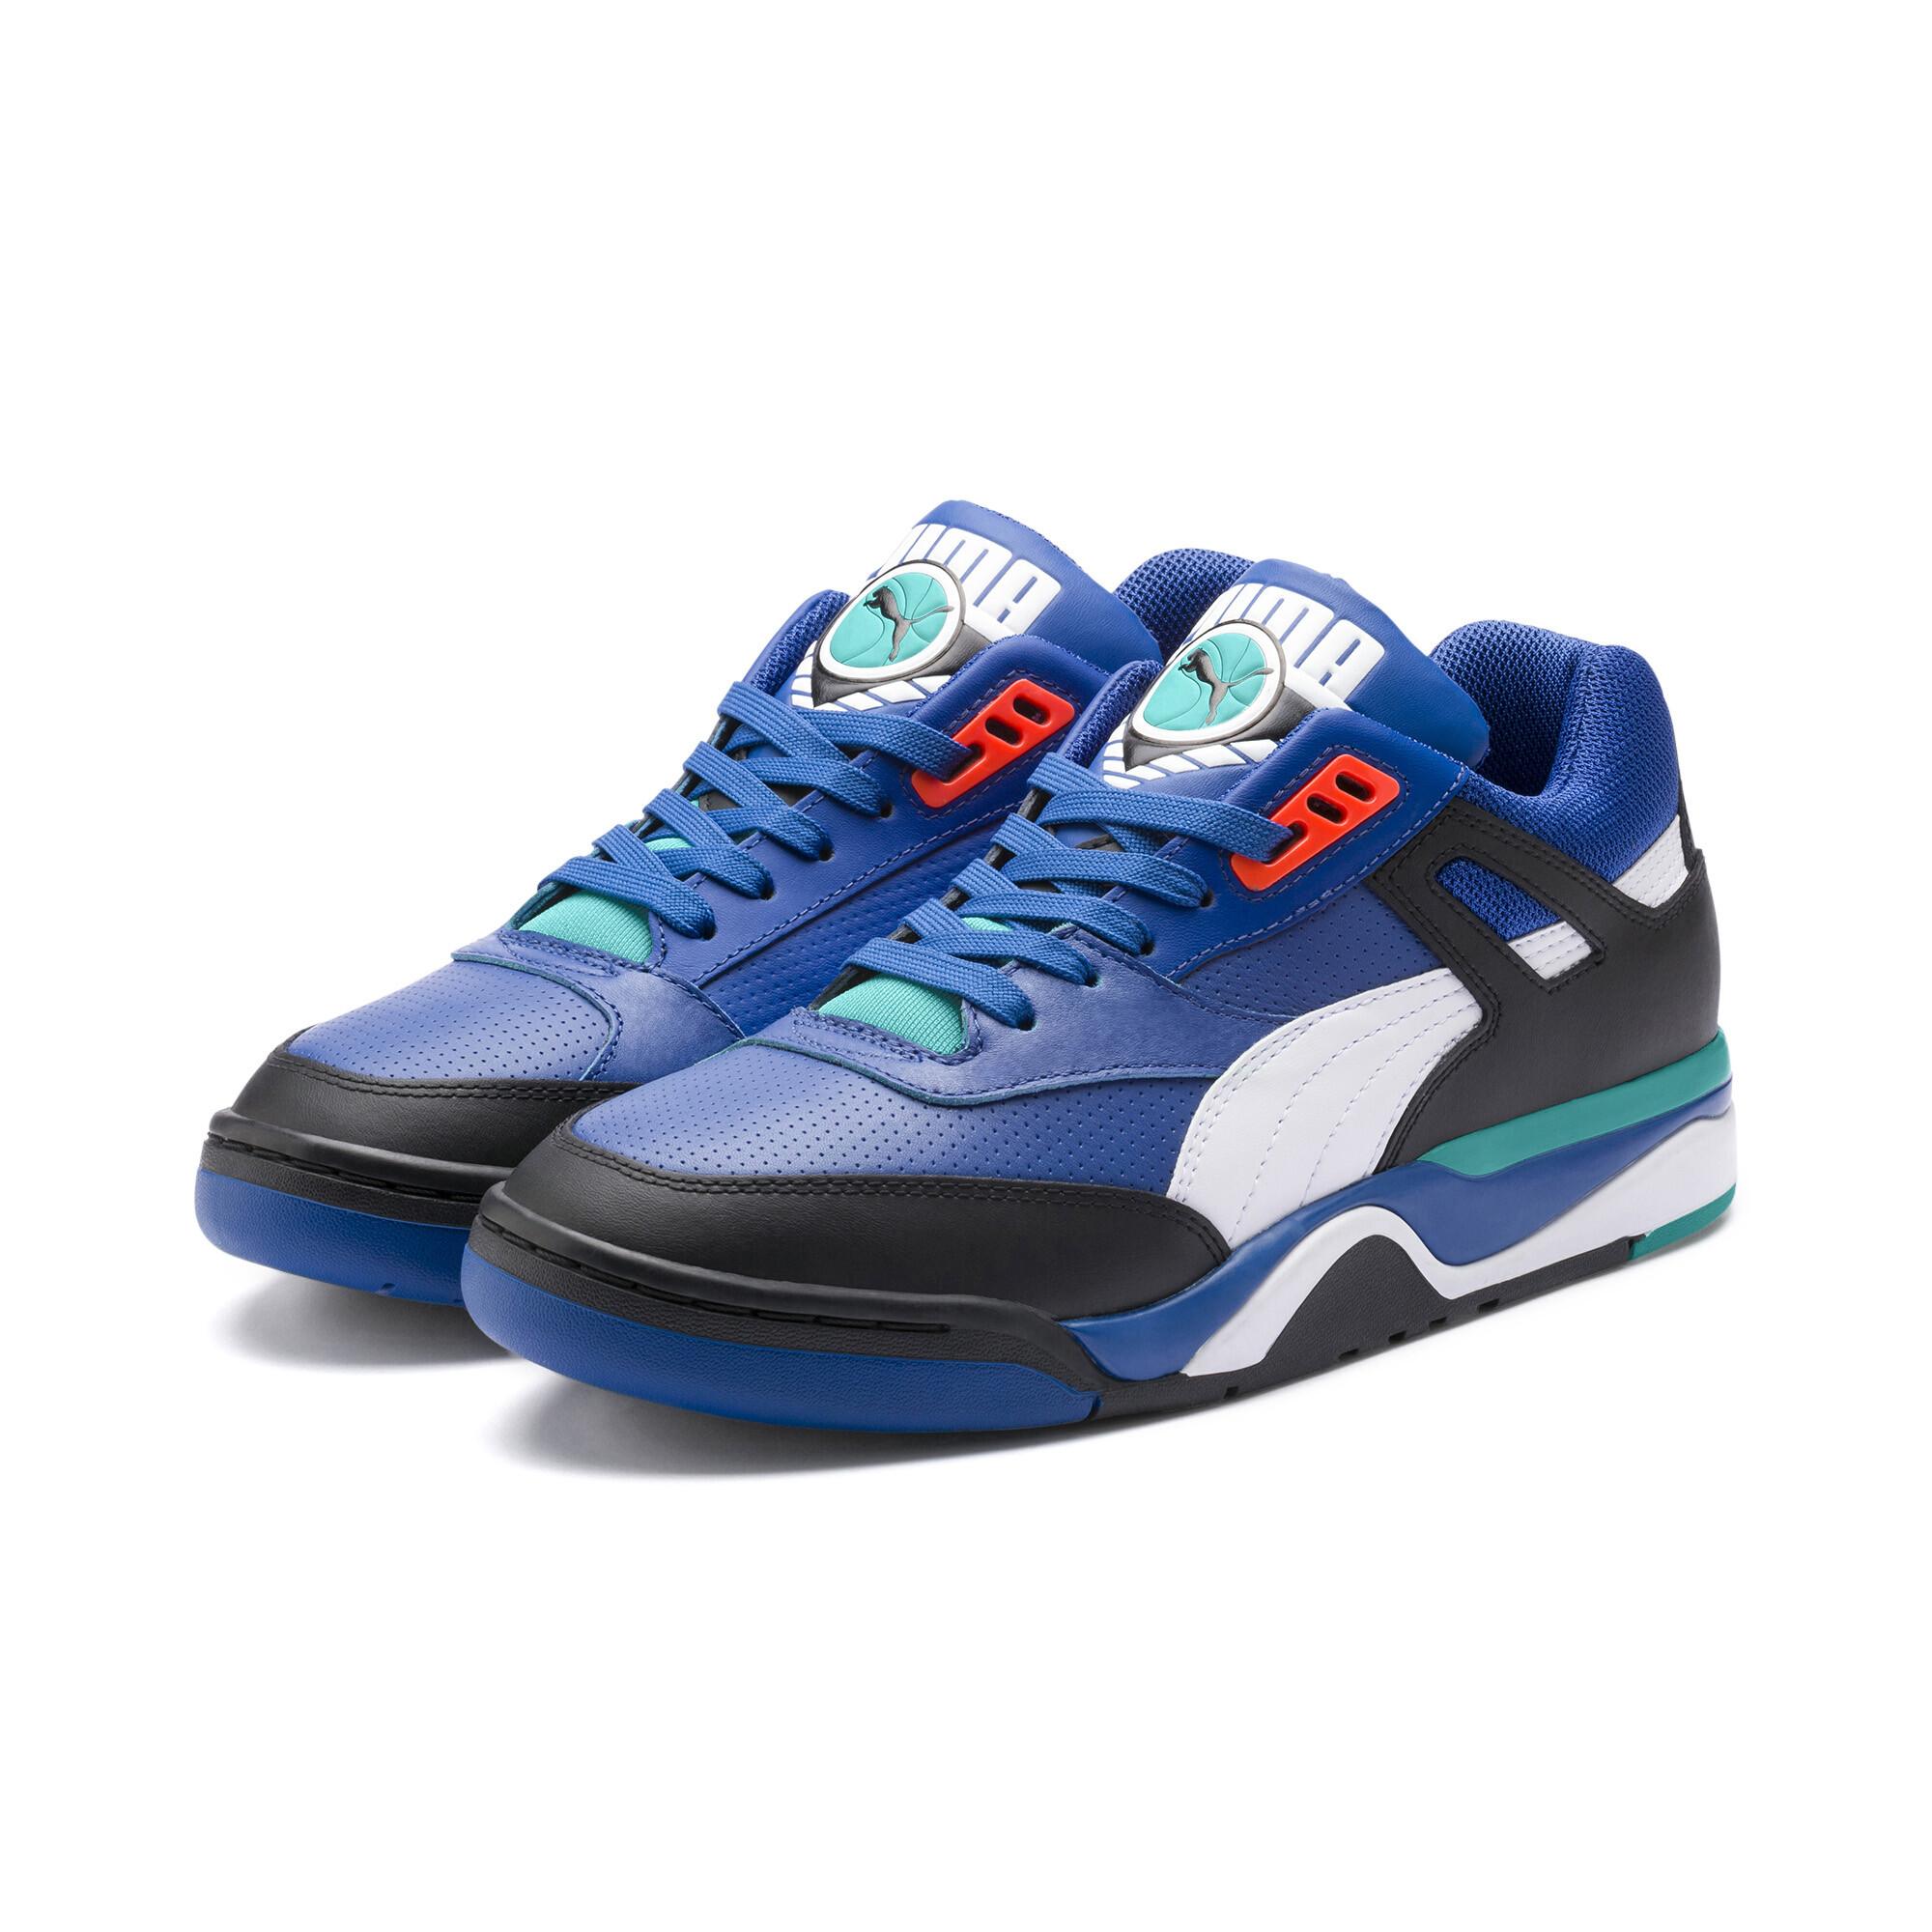 Indexbild 41 - PUMA Palace Guard Sneaker Unisex Schuhe Sport Classics Neu